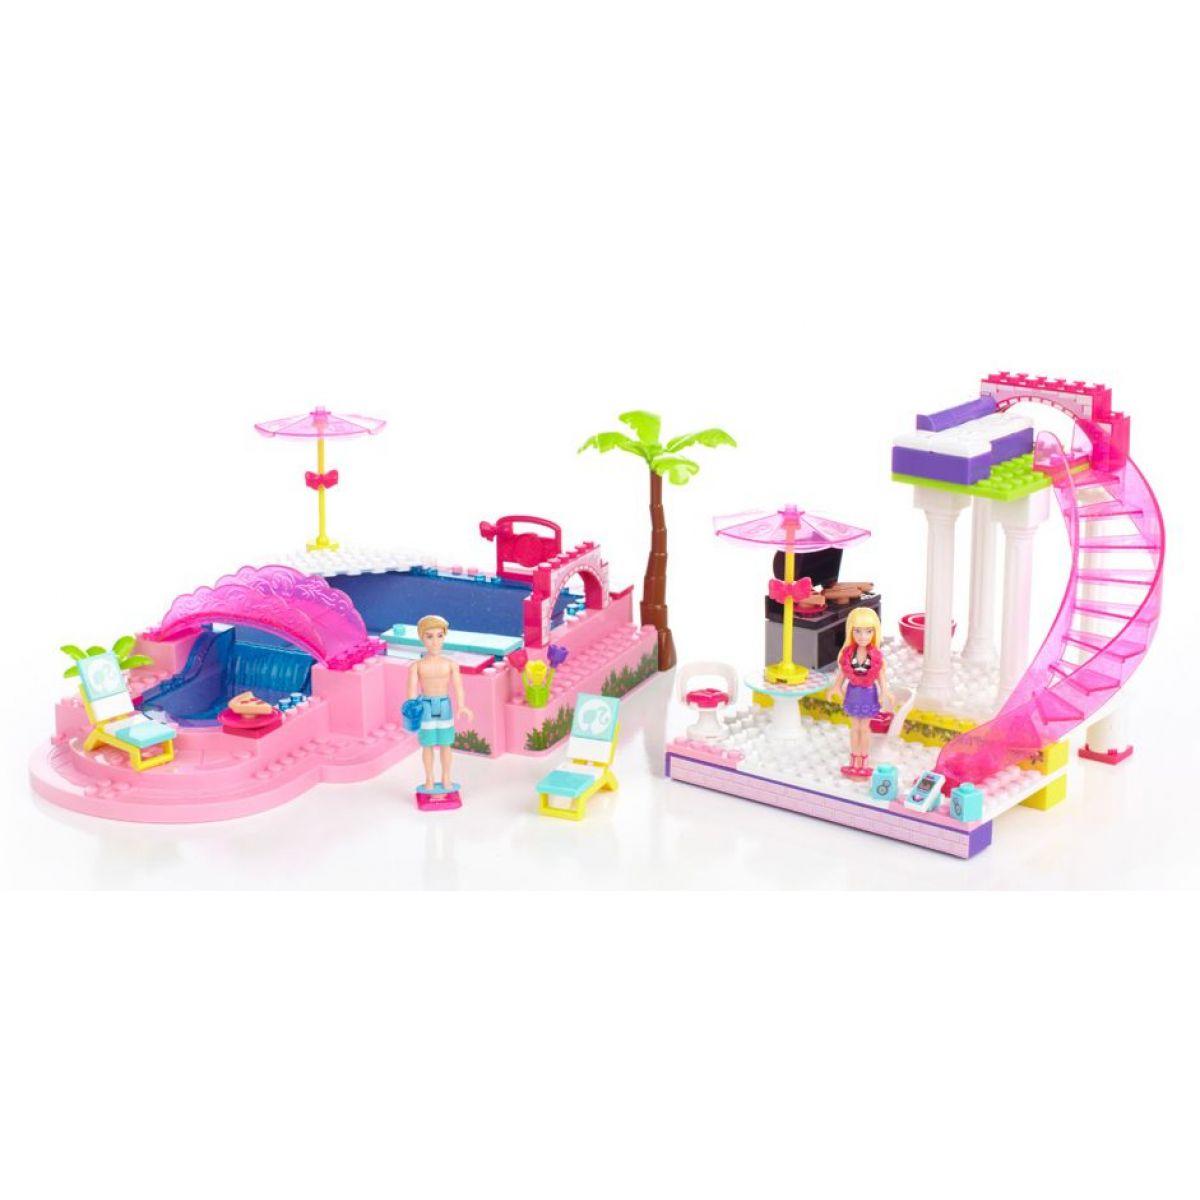 Megabloks Barbie na párty u bazénu 159 kostek